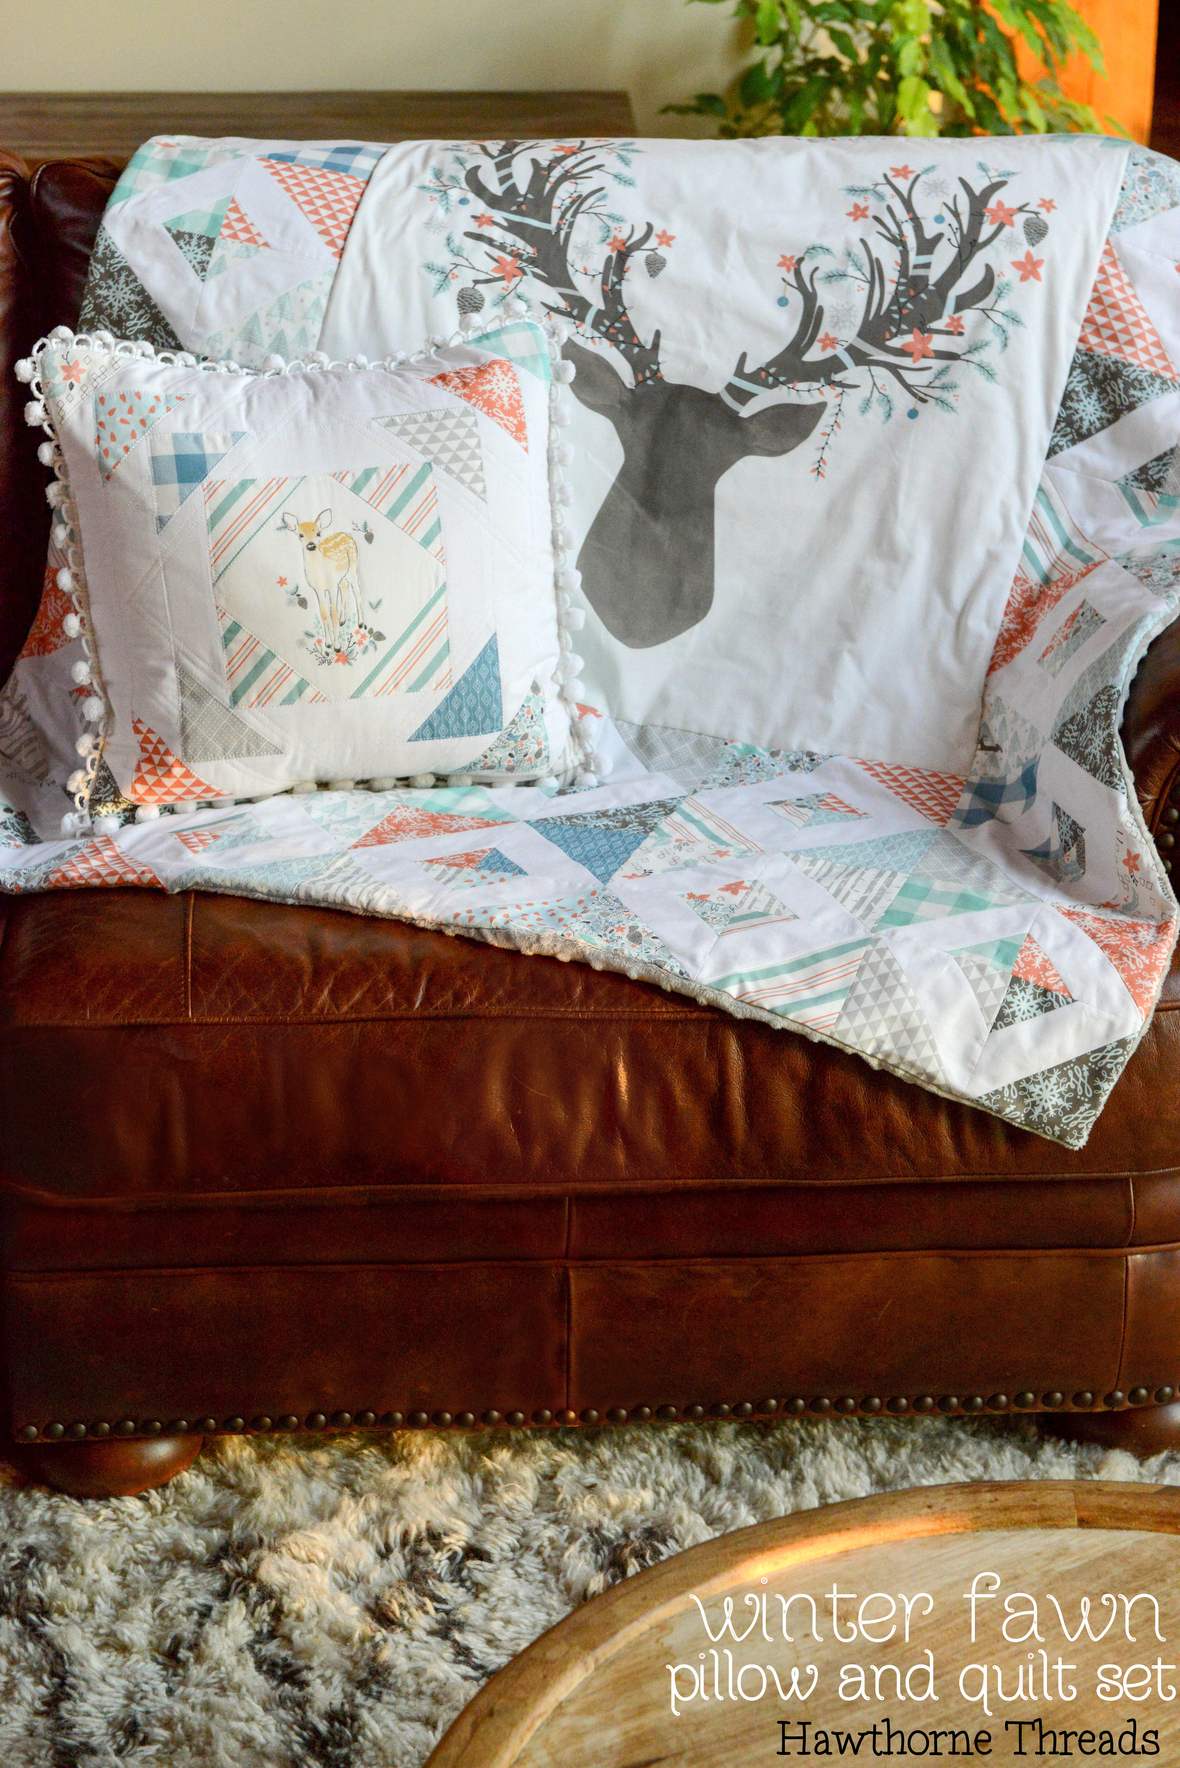 Winter Fawn Fabric